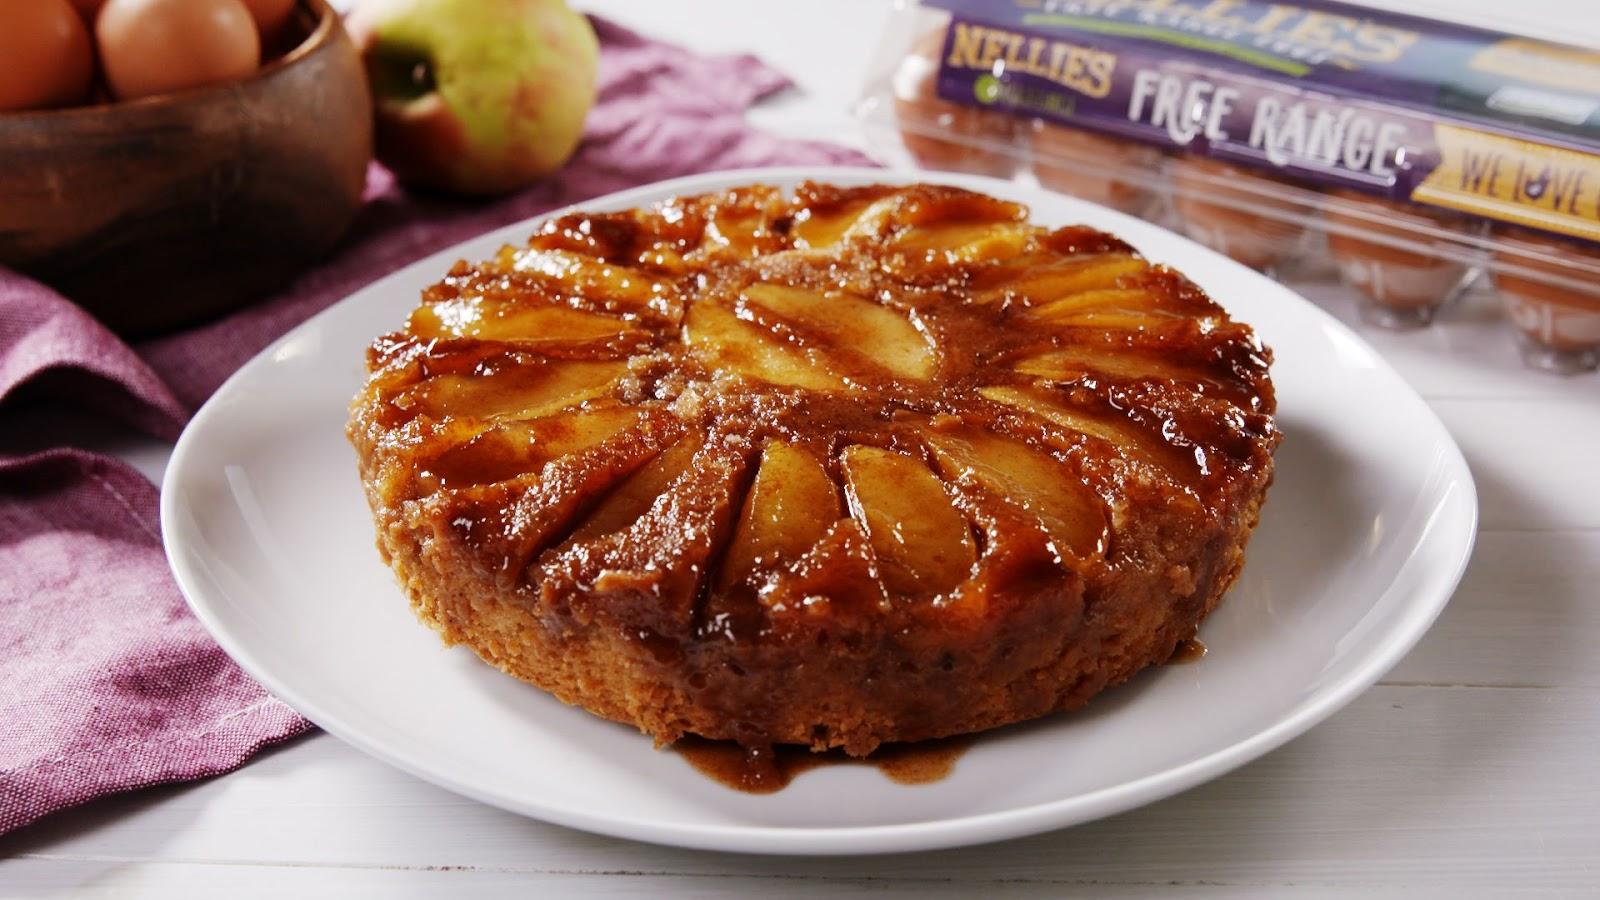 CARAMEL APPLE UPSIDE-DOWN CAKE #dessert #caramel